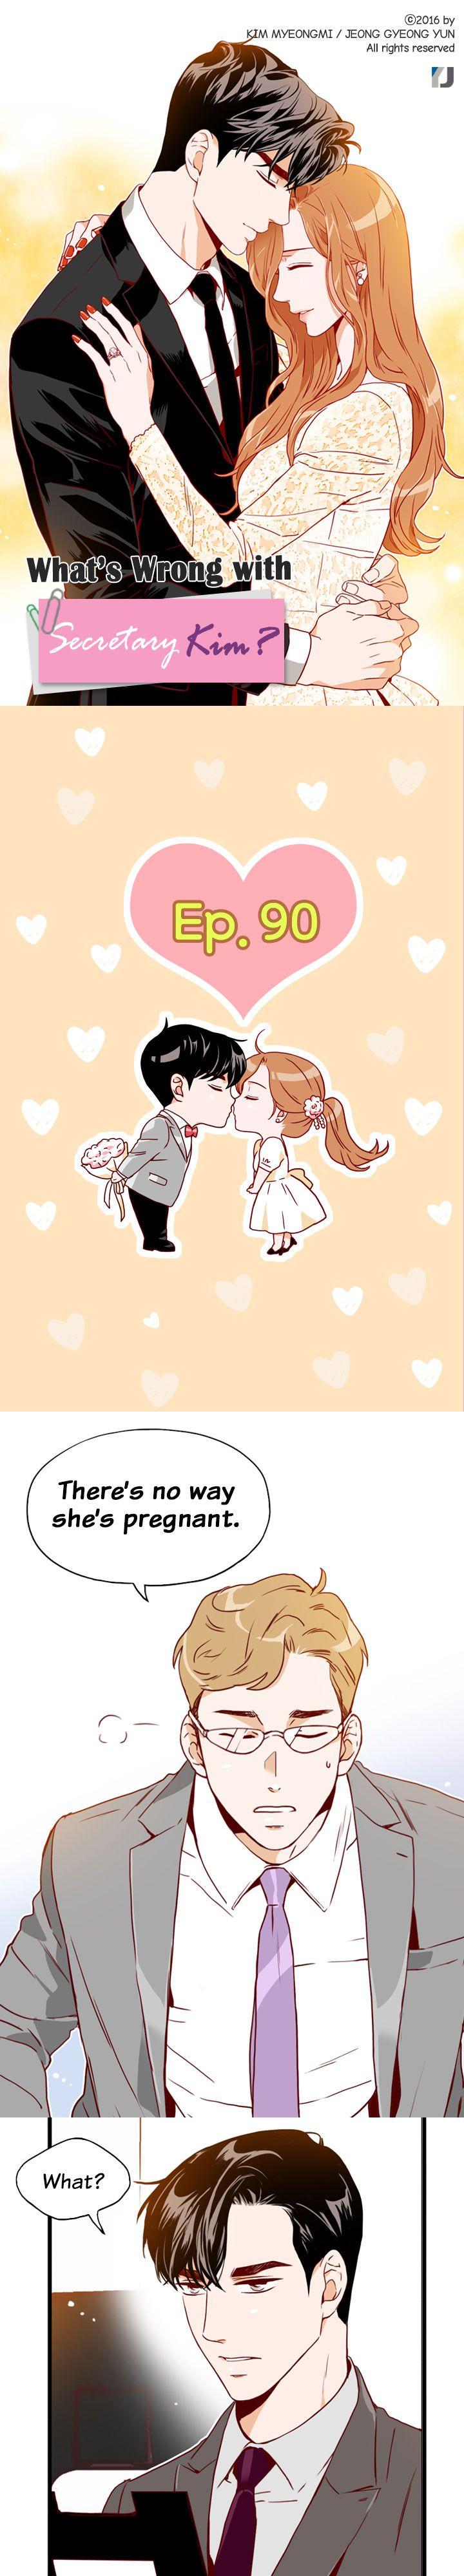 https://manga.mangadogs.com/comics/pic2/15/25807/960747/c185c3de5e72b65070afd29d68191033.jpg Page 1